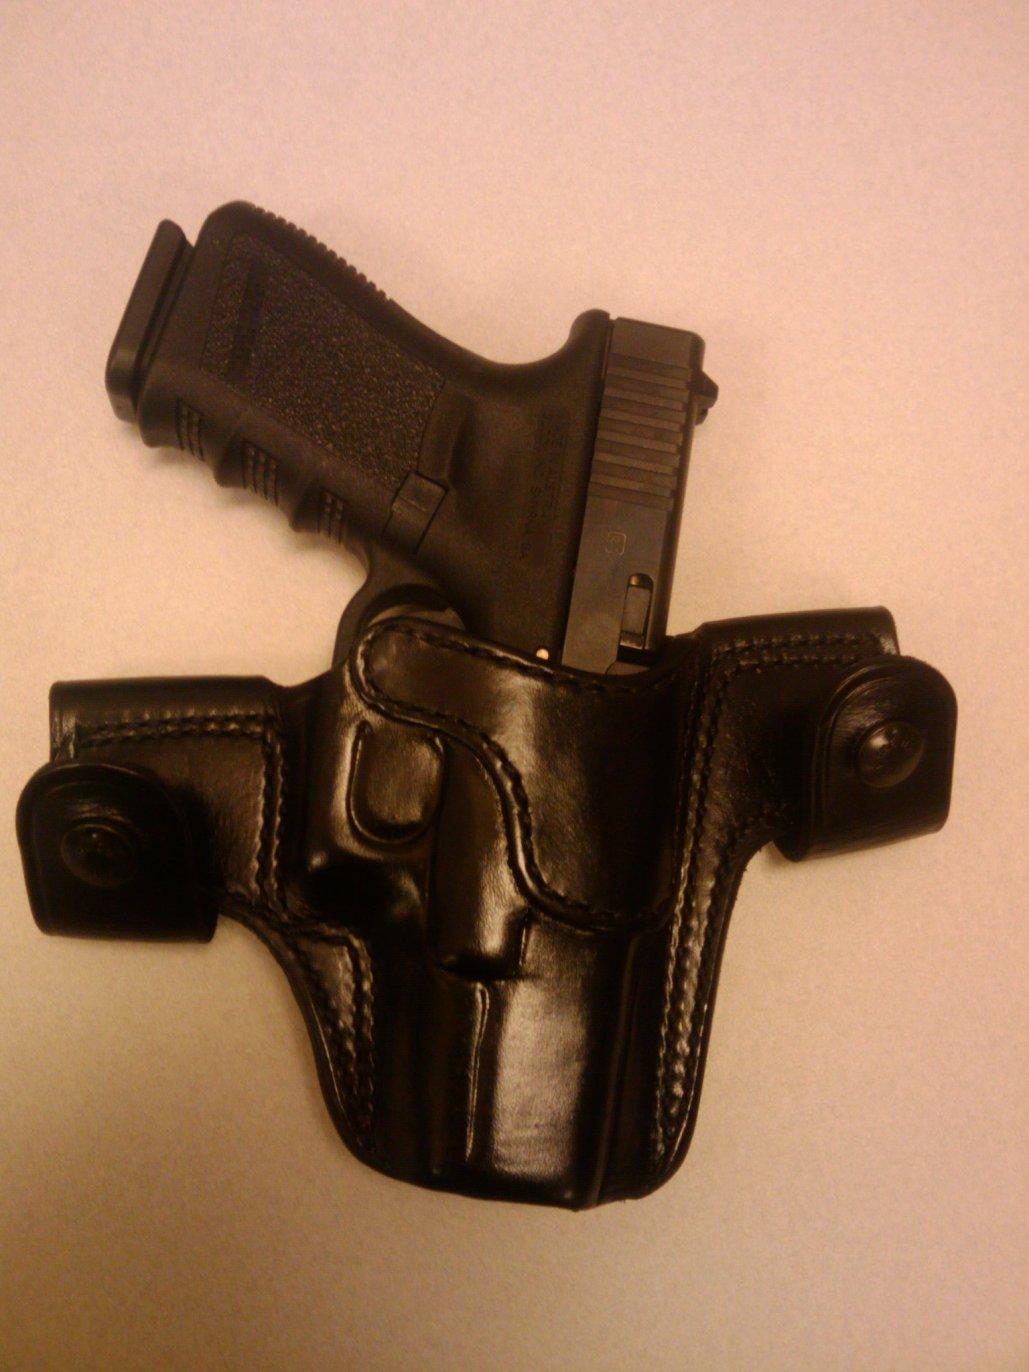 Got my Alessi holsters!-alessi-cqc-s.jpg